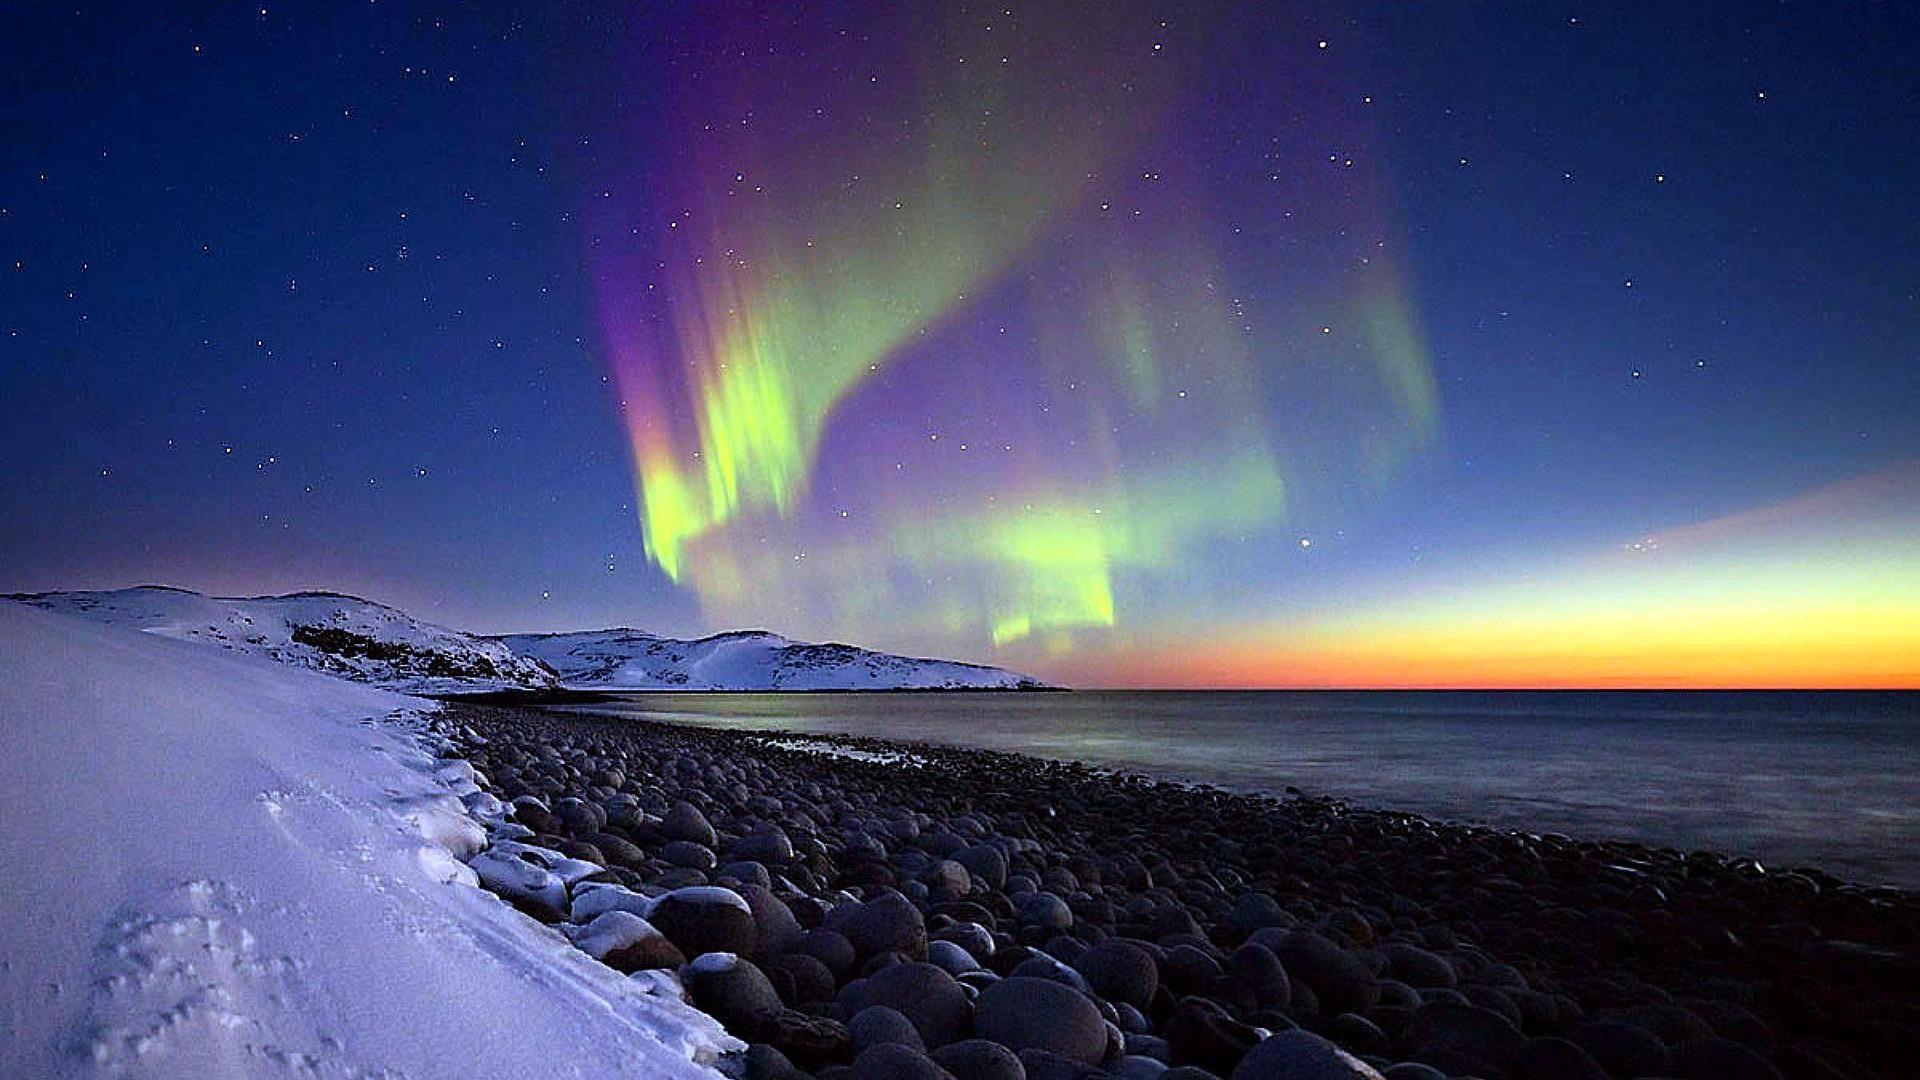 Aurora Borealis 5 HD Screensavers | HD Image Wallpaper | Magical Skies | Aurora borealis, Aurora ...